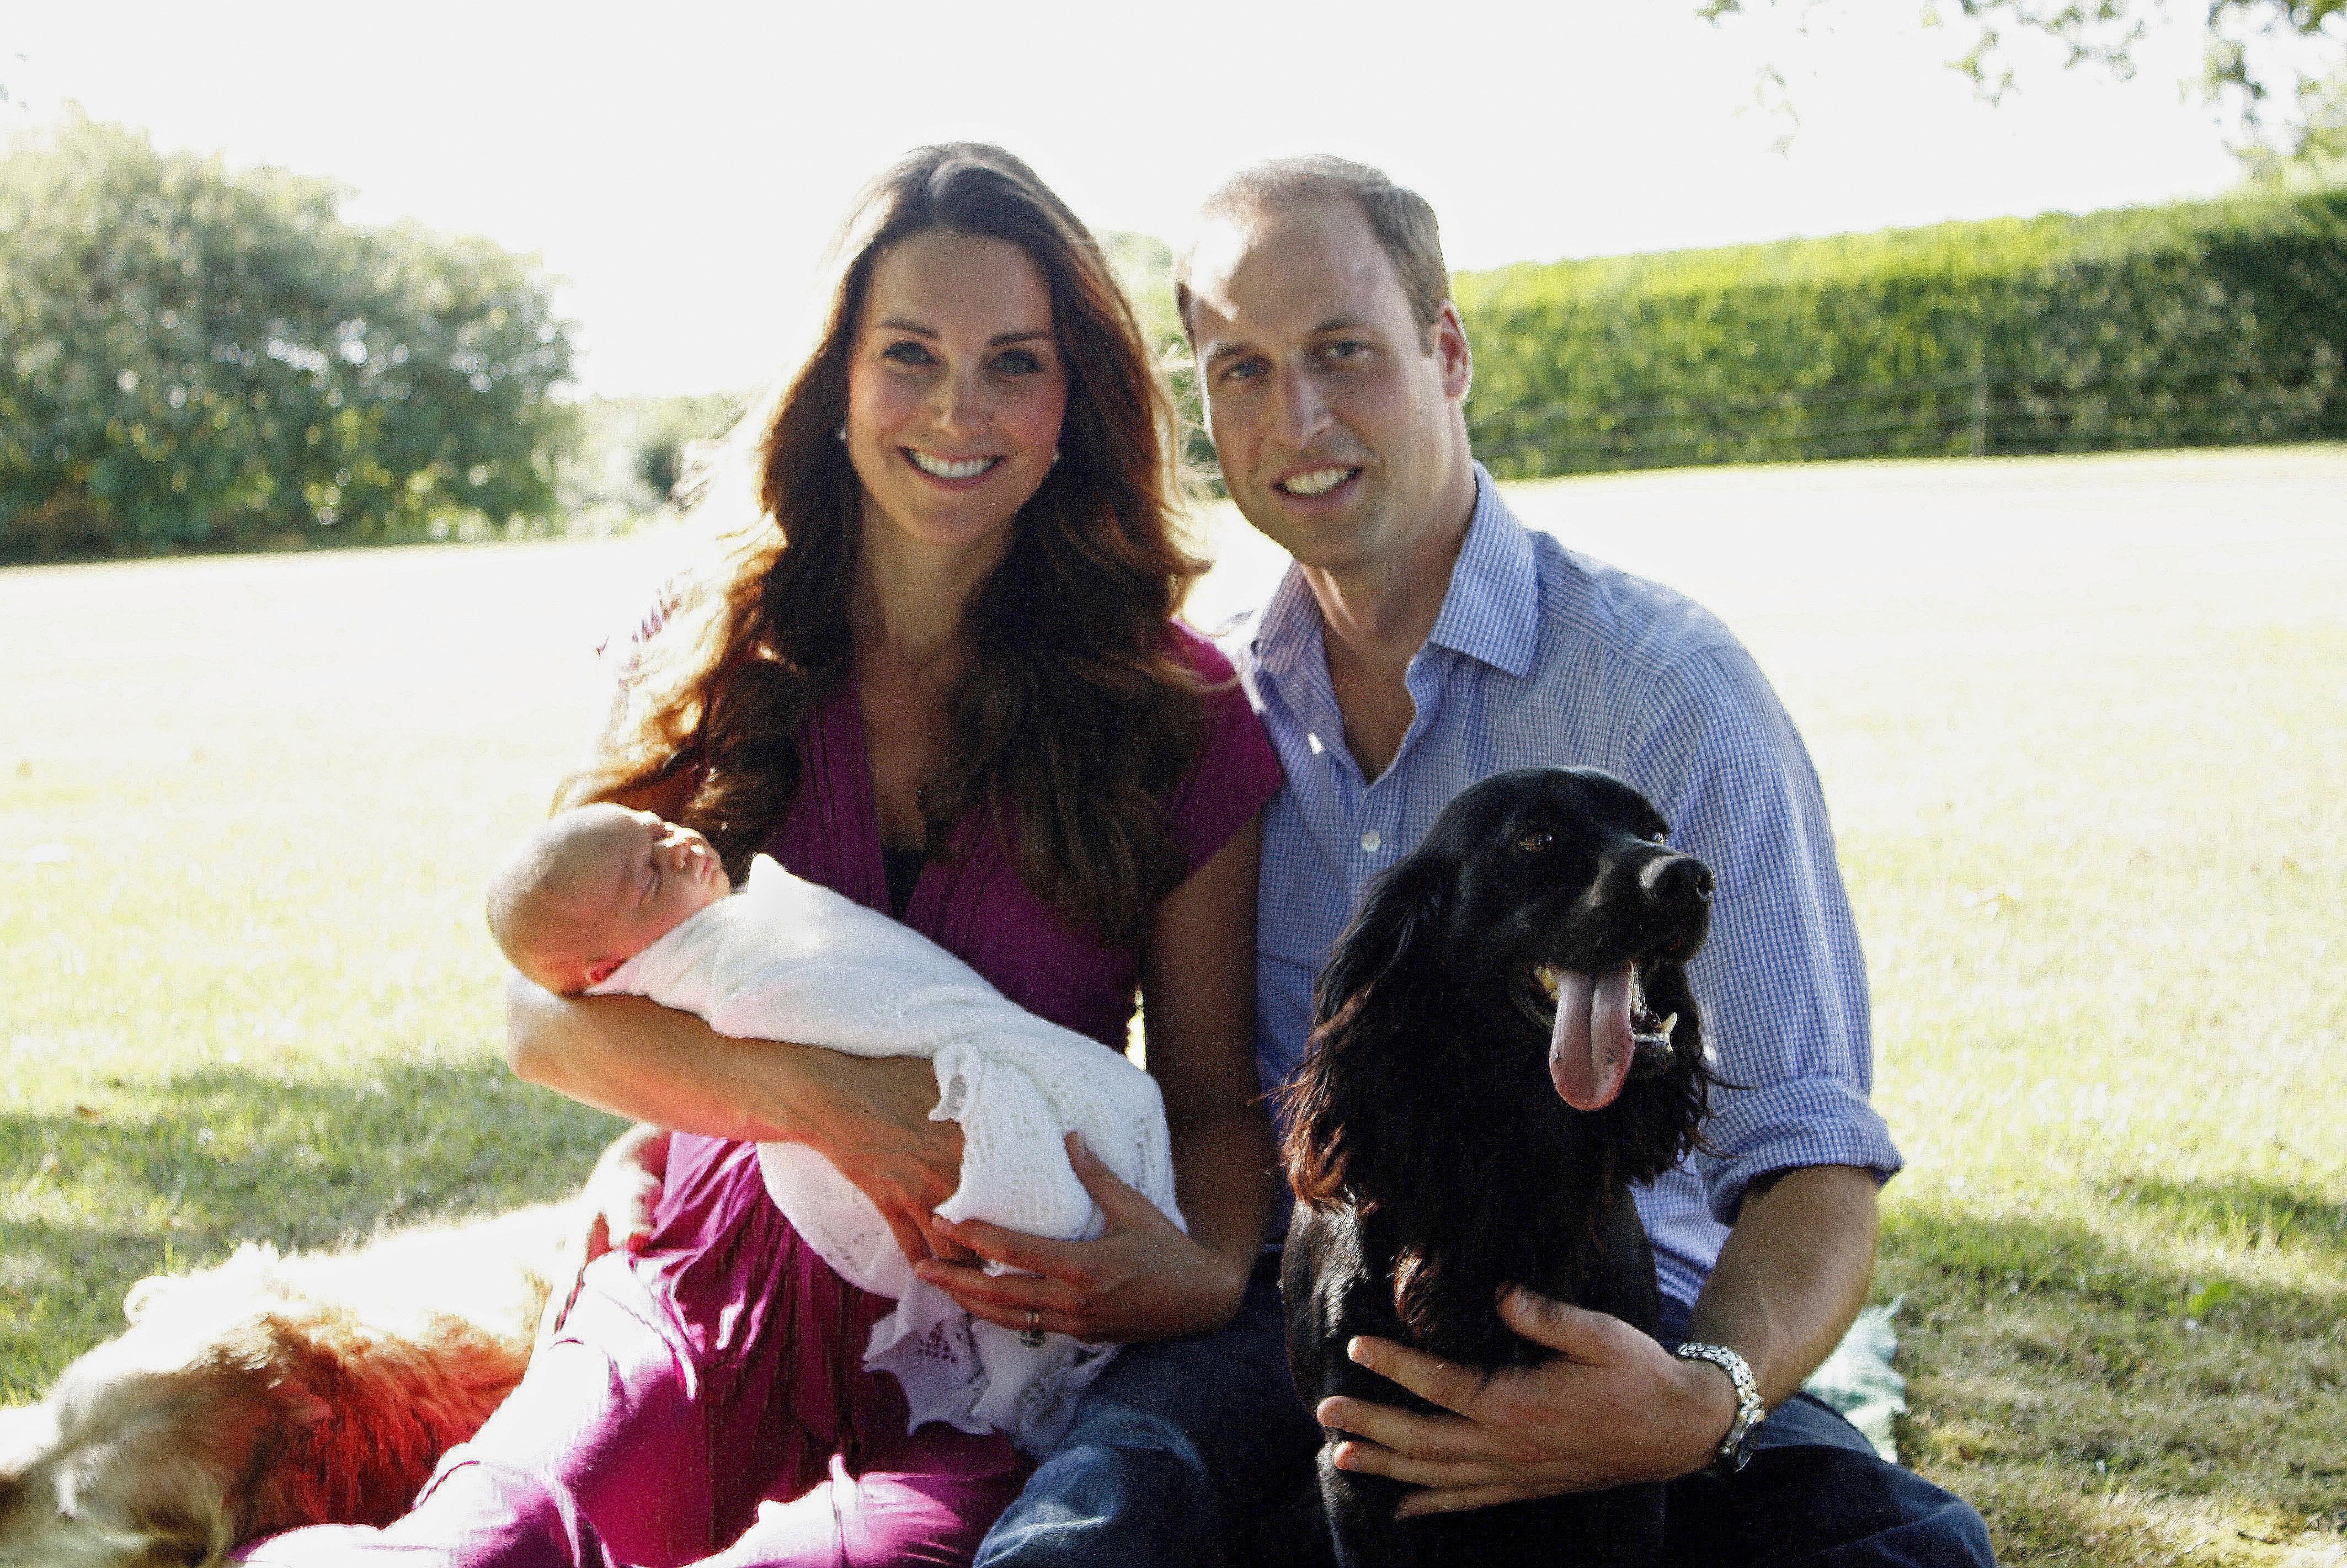 Video: Queen Elizabeth Poshly Admonishes Grandson: 'Stand up, William'